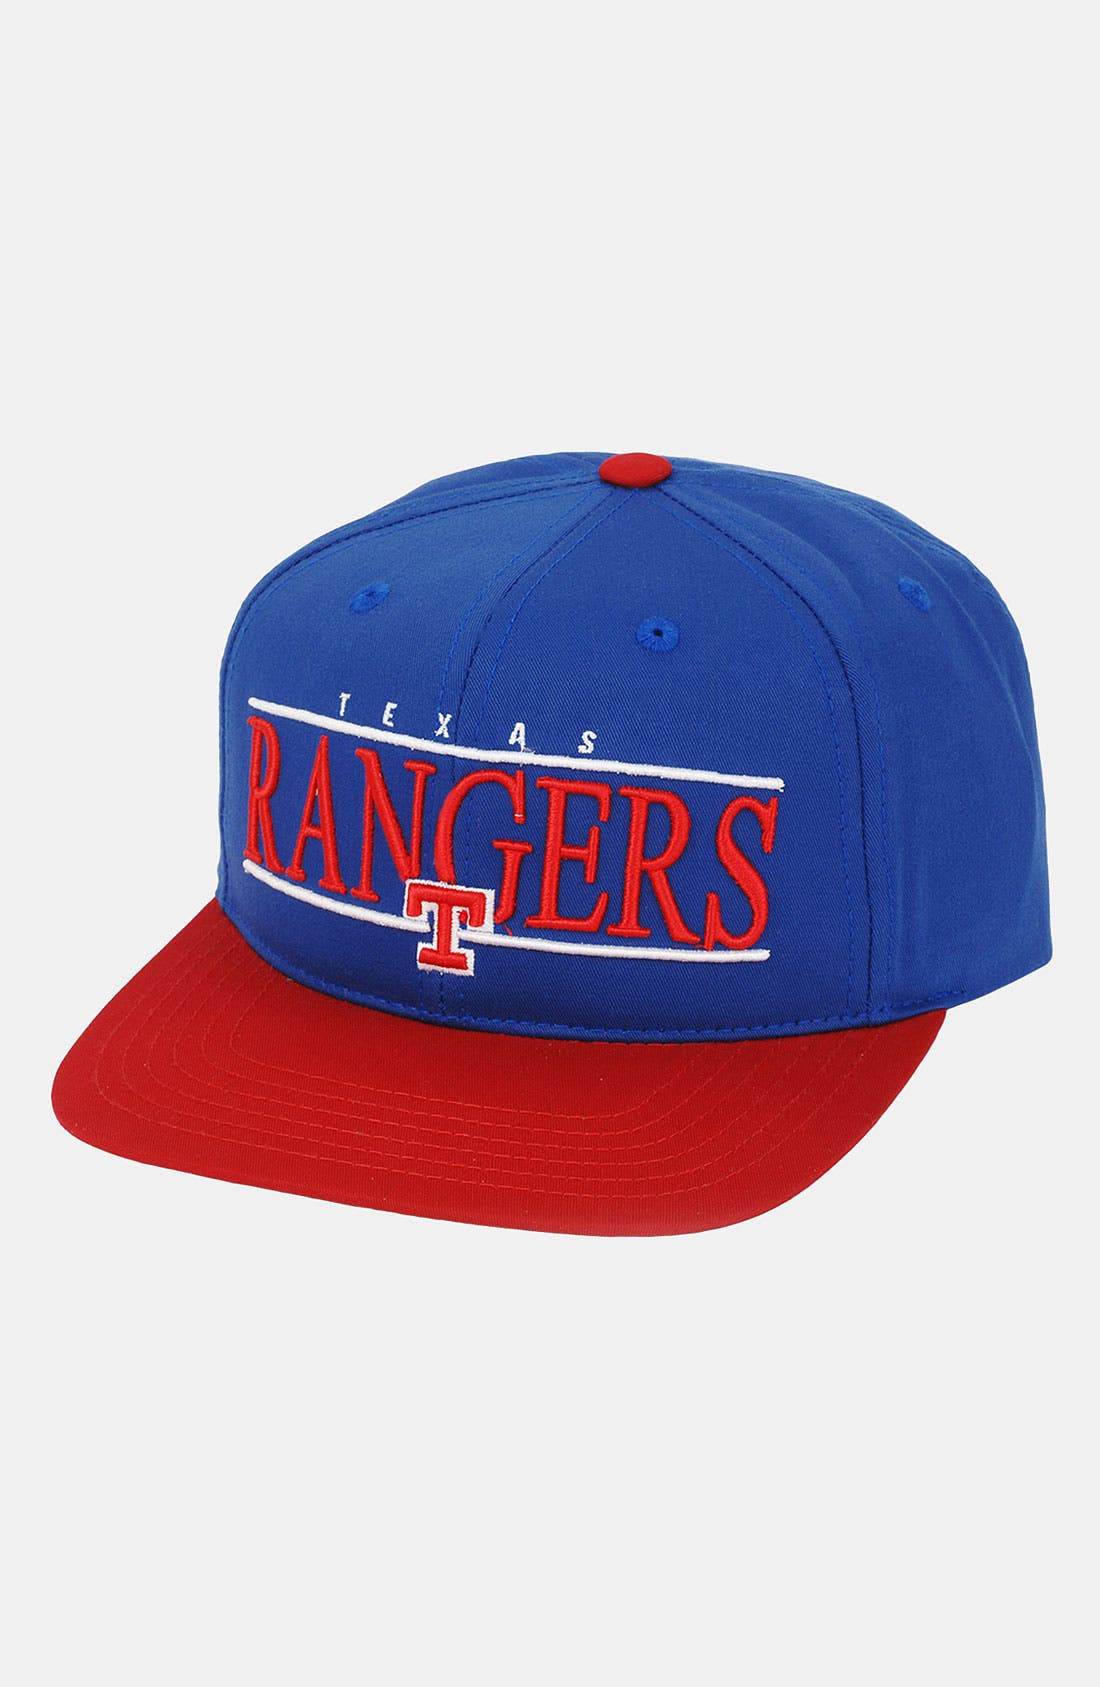 Alternate Image 1 Selected - American Needle 'Texas Rangers - Nineties' Twill Snapback Baseball Cap